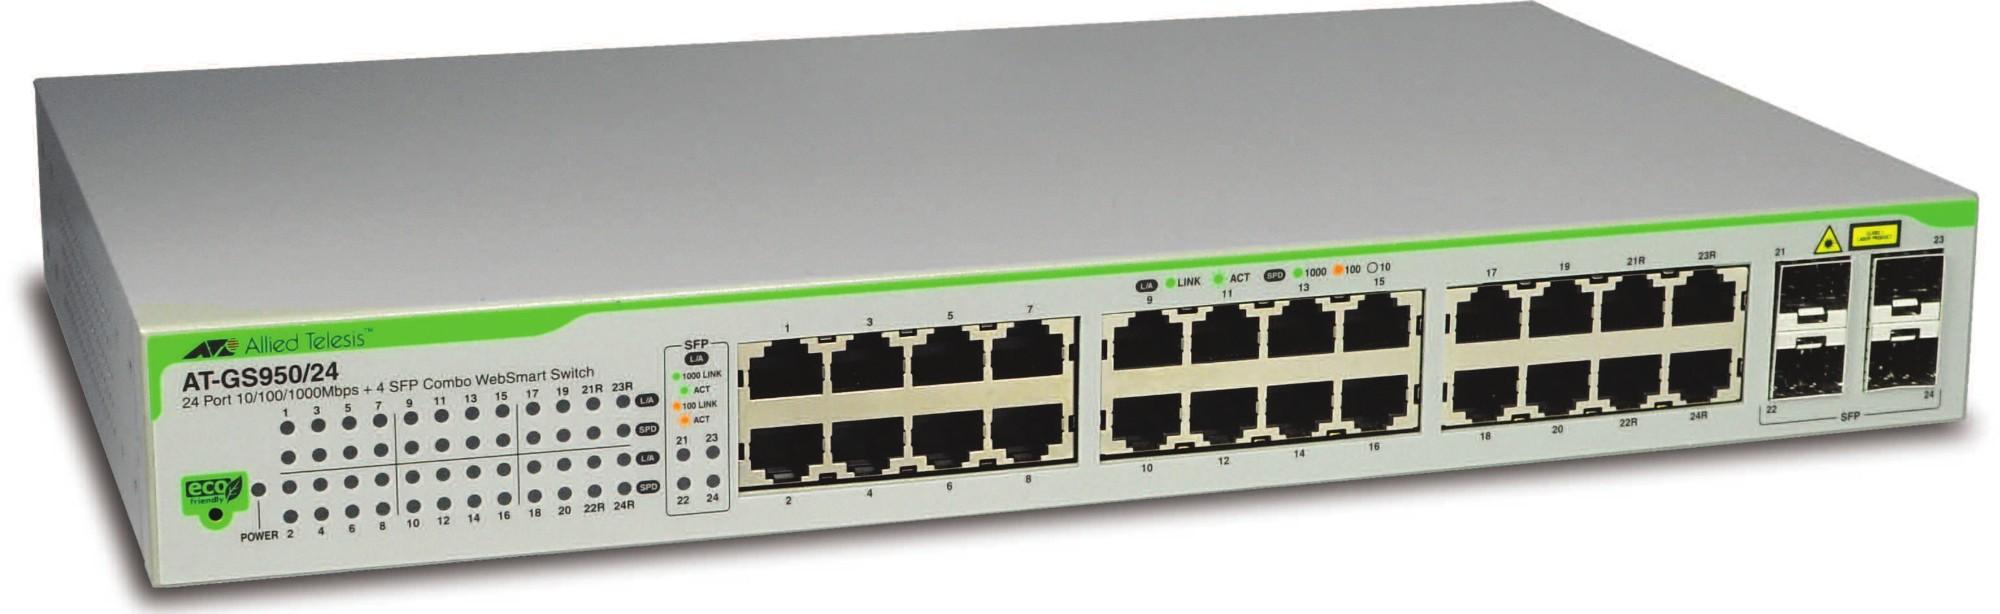 Allied Telesis AT-GS950/24-50 Gestionado